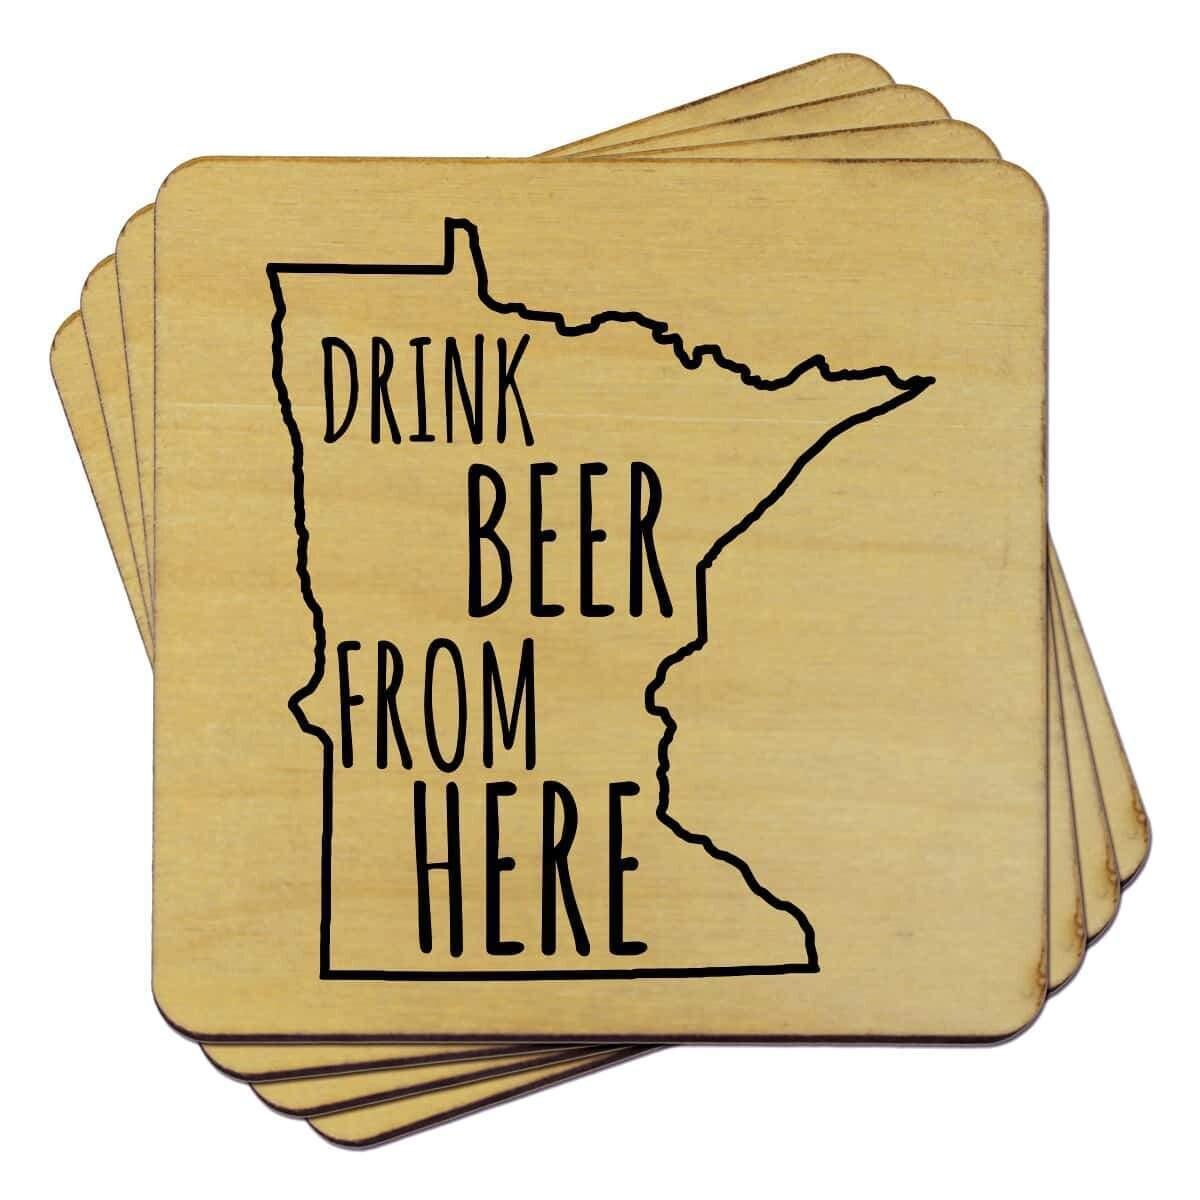 Drink Beer From Here - Minnesota UV Printed Coasters - Set of 4